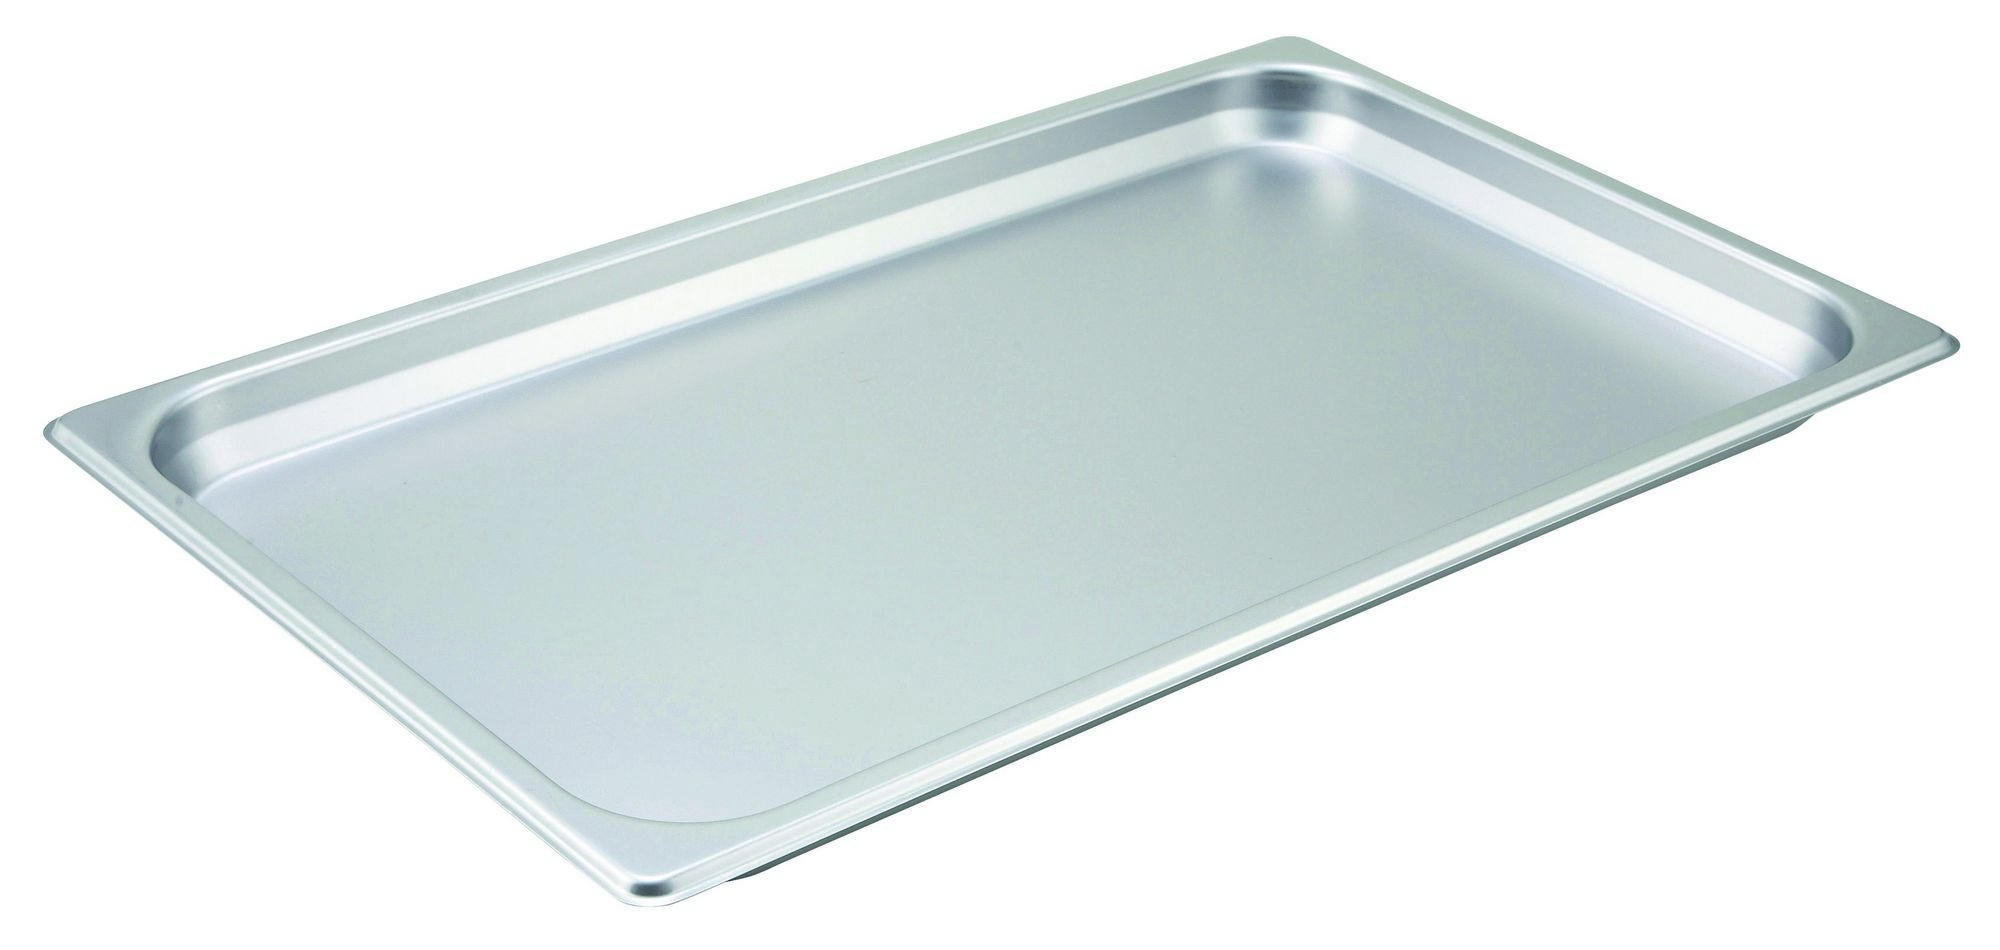 "Winco SPF1 Full Size Steam Table Pan, 25 Gauge, 1-1/2"" Deep"